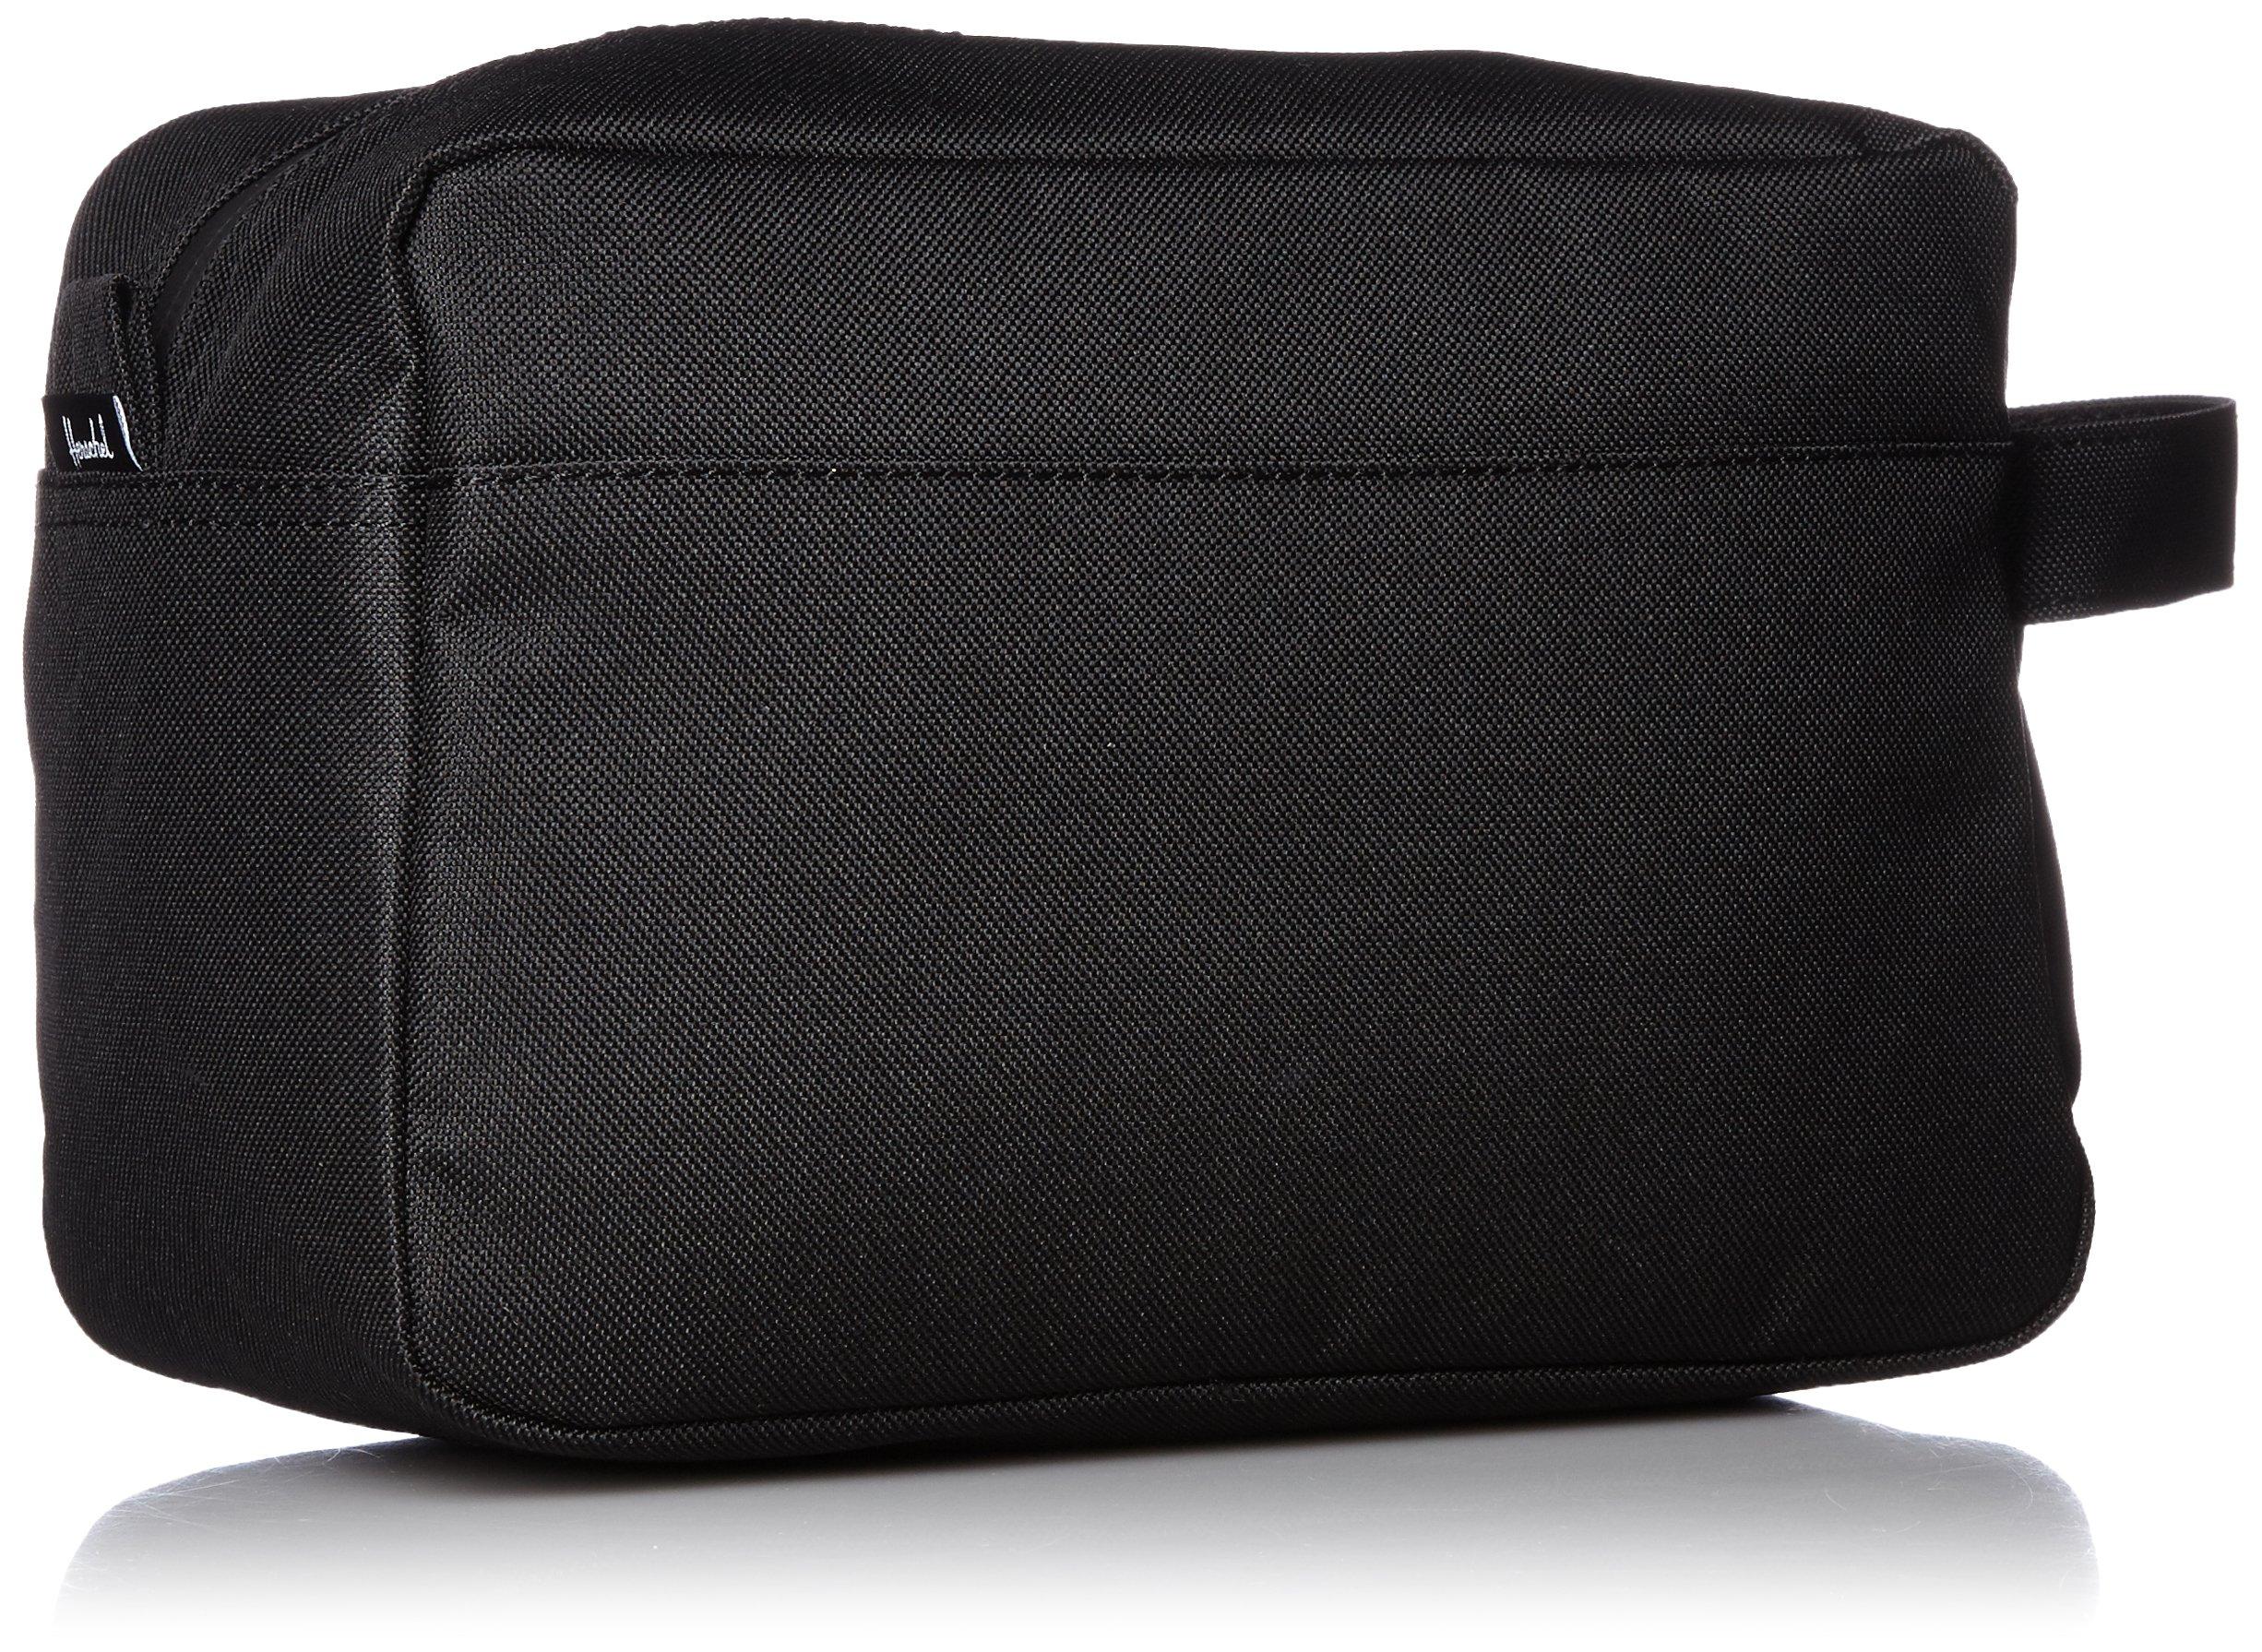 Herschel Supply Co. Chapter Travel Kit,Black,One Size by Herschel Supply Co. (Image #5)